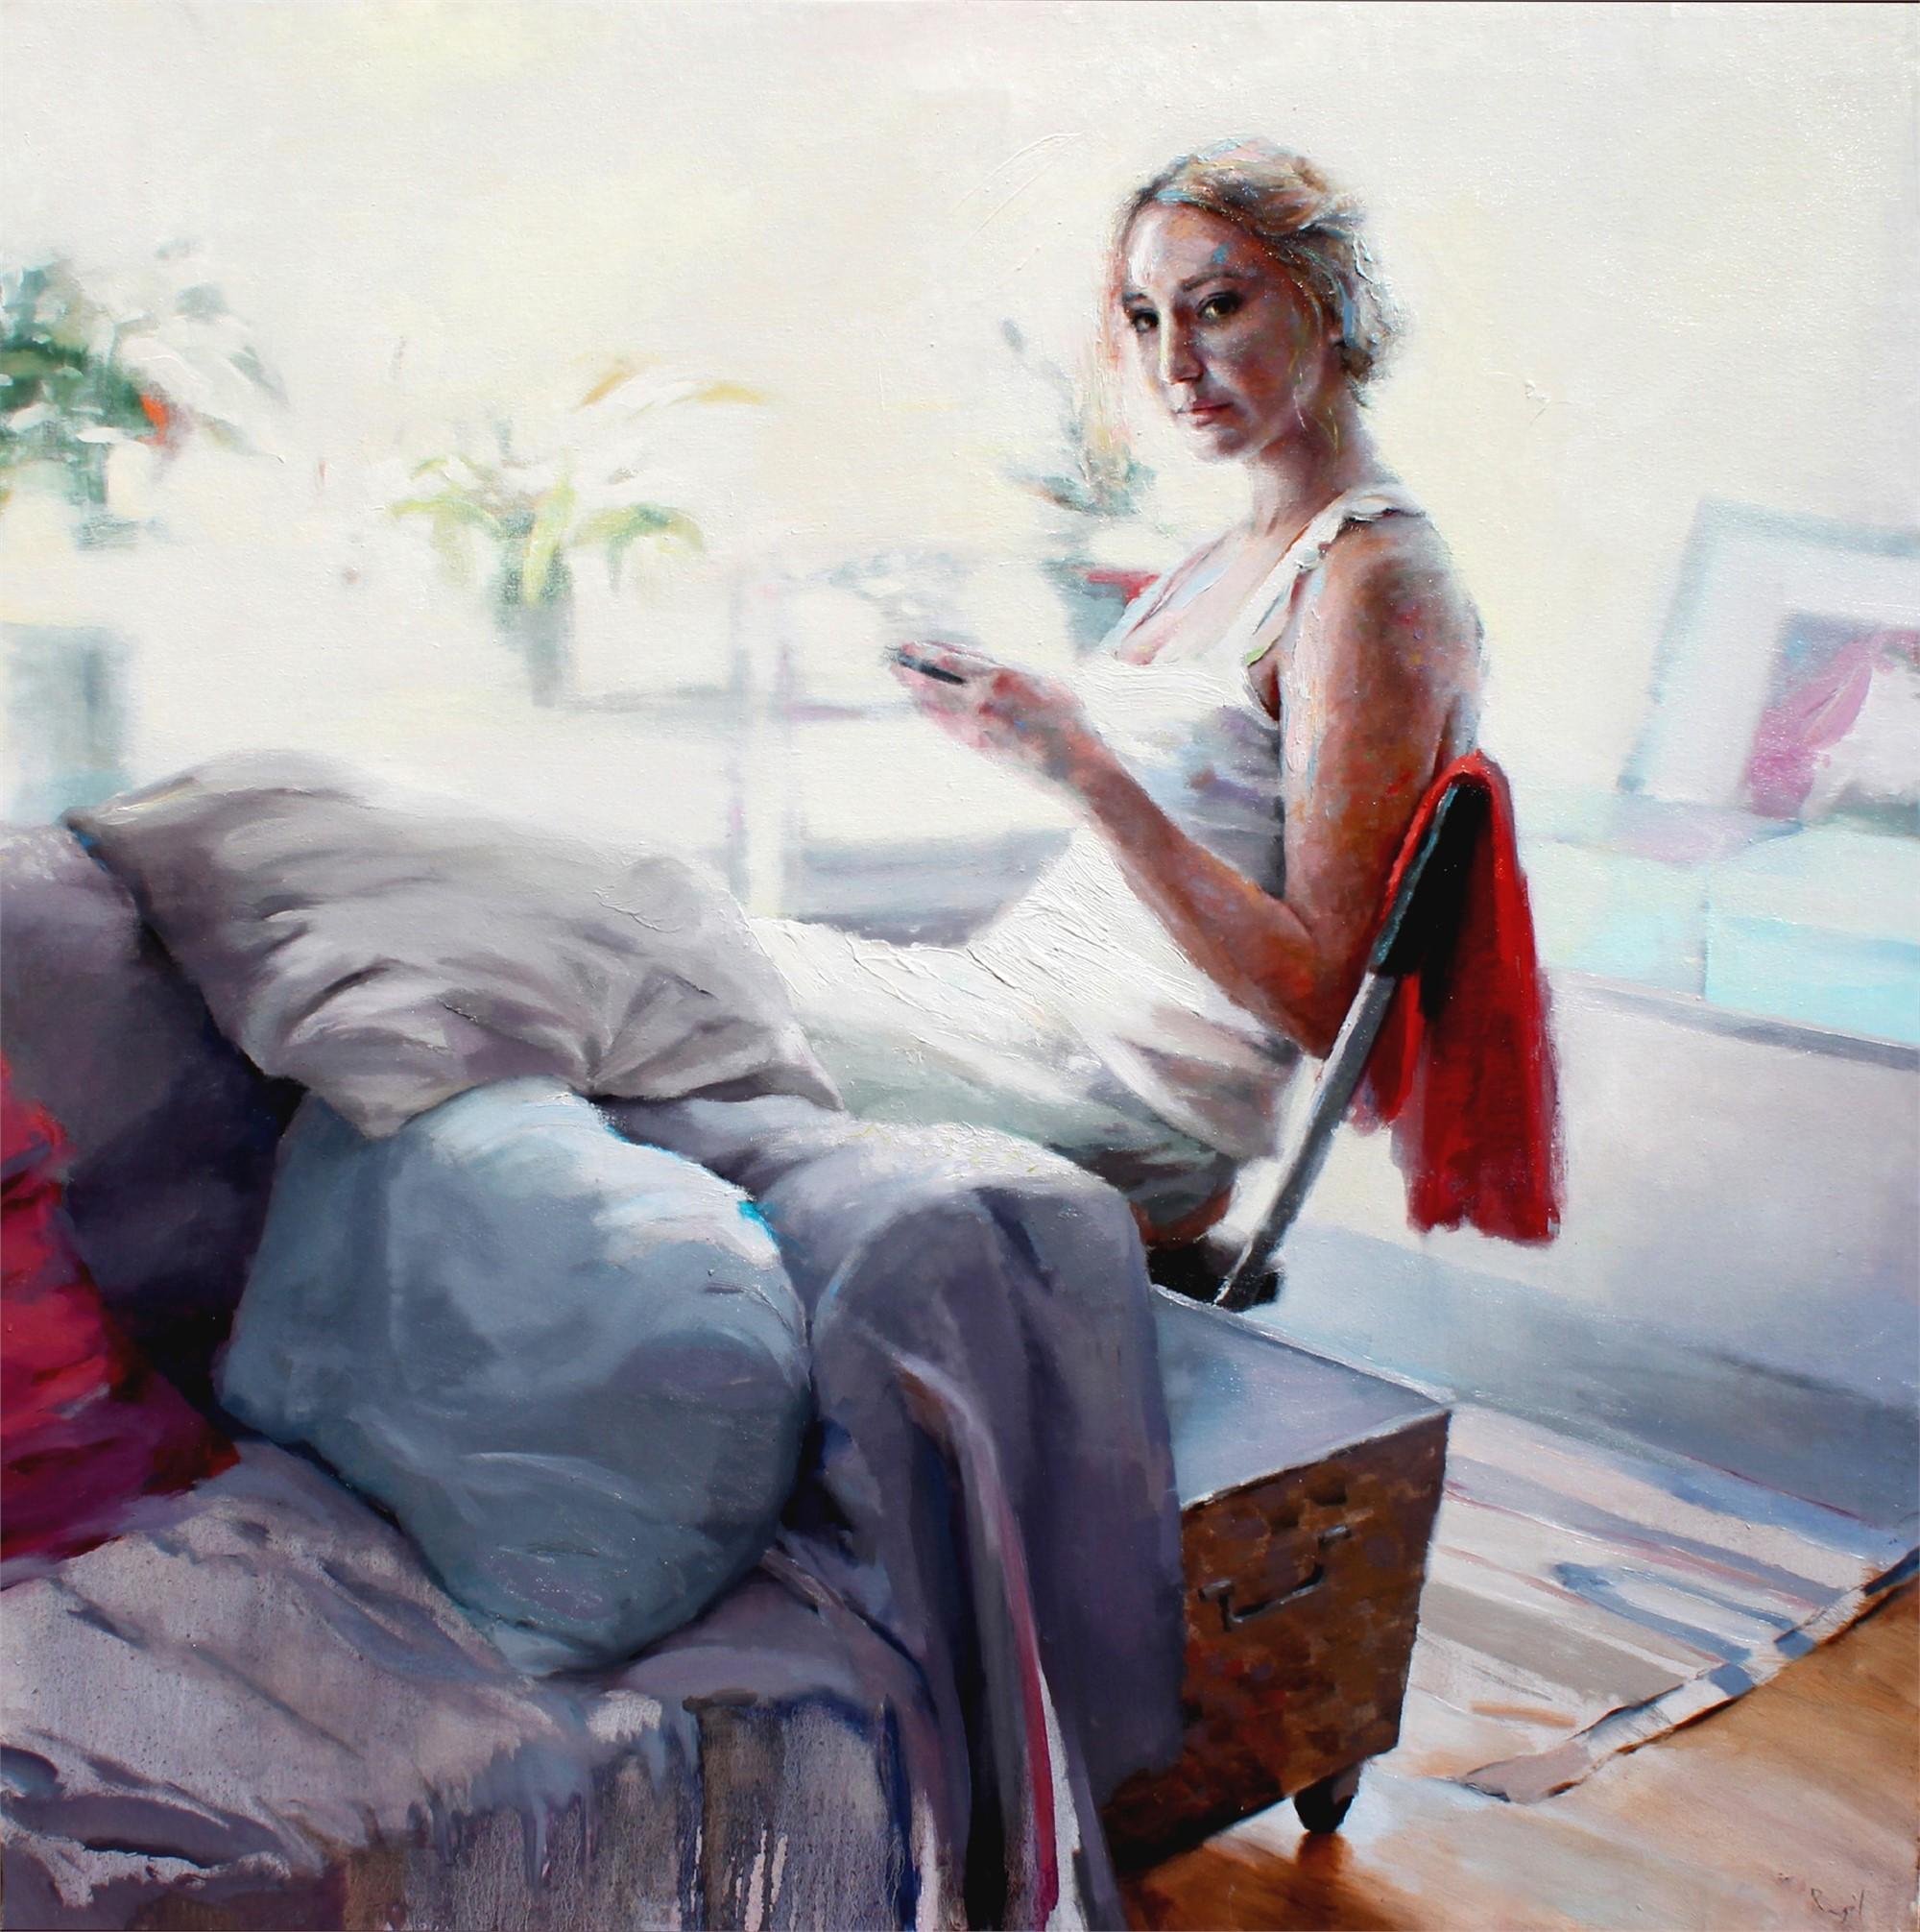 Tamara and Her Serene Sadness by Susana Ragel